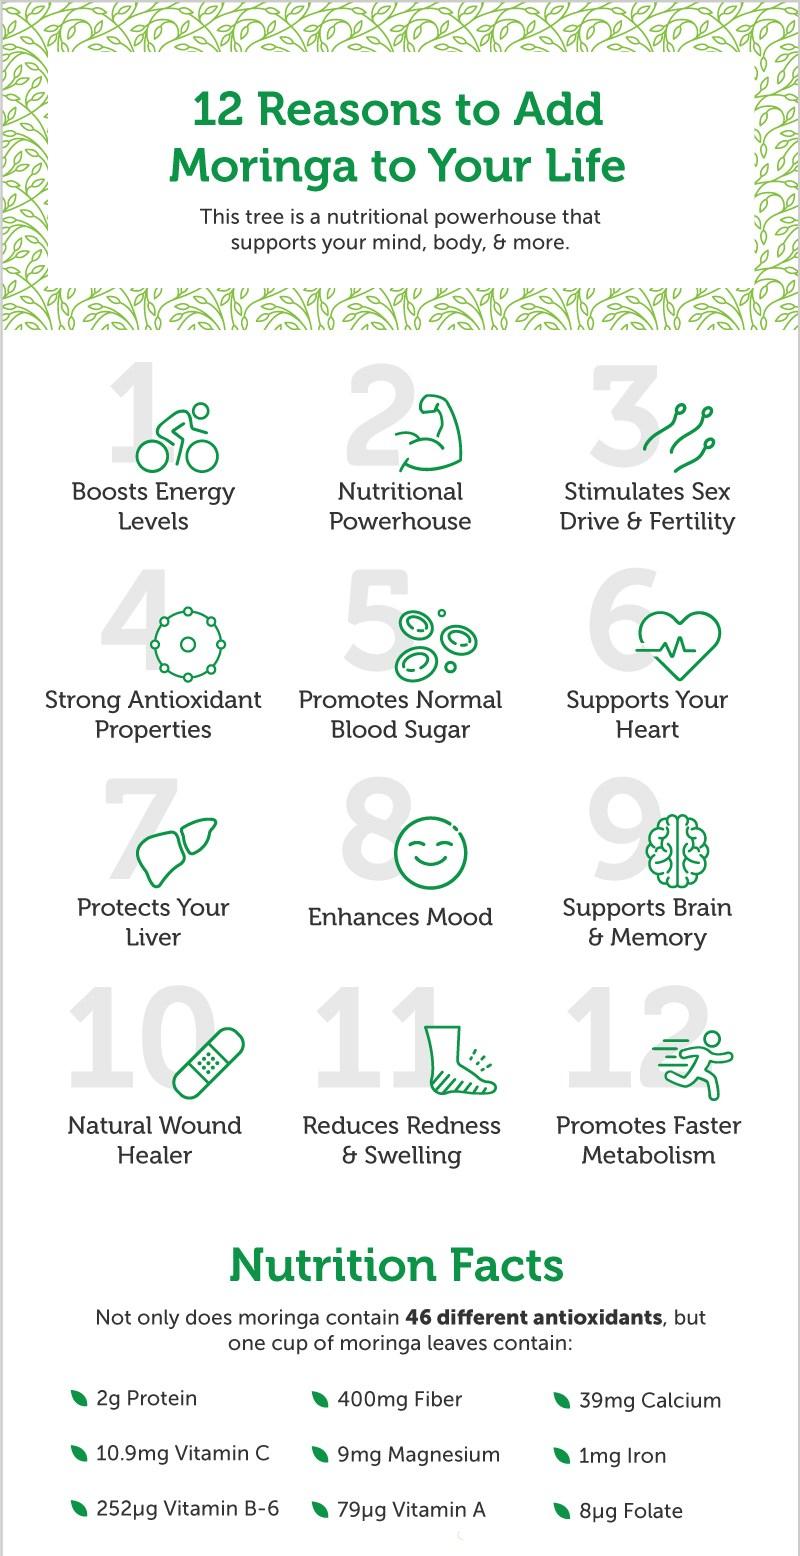 benefits-of-moringa-infographic